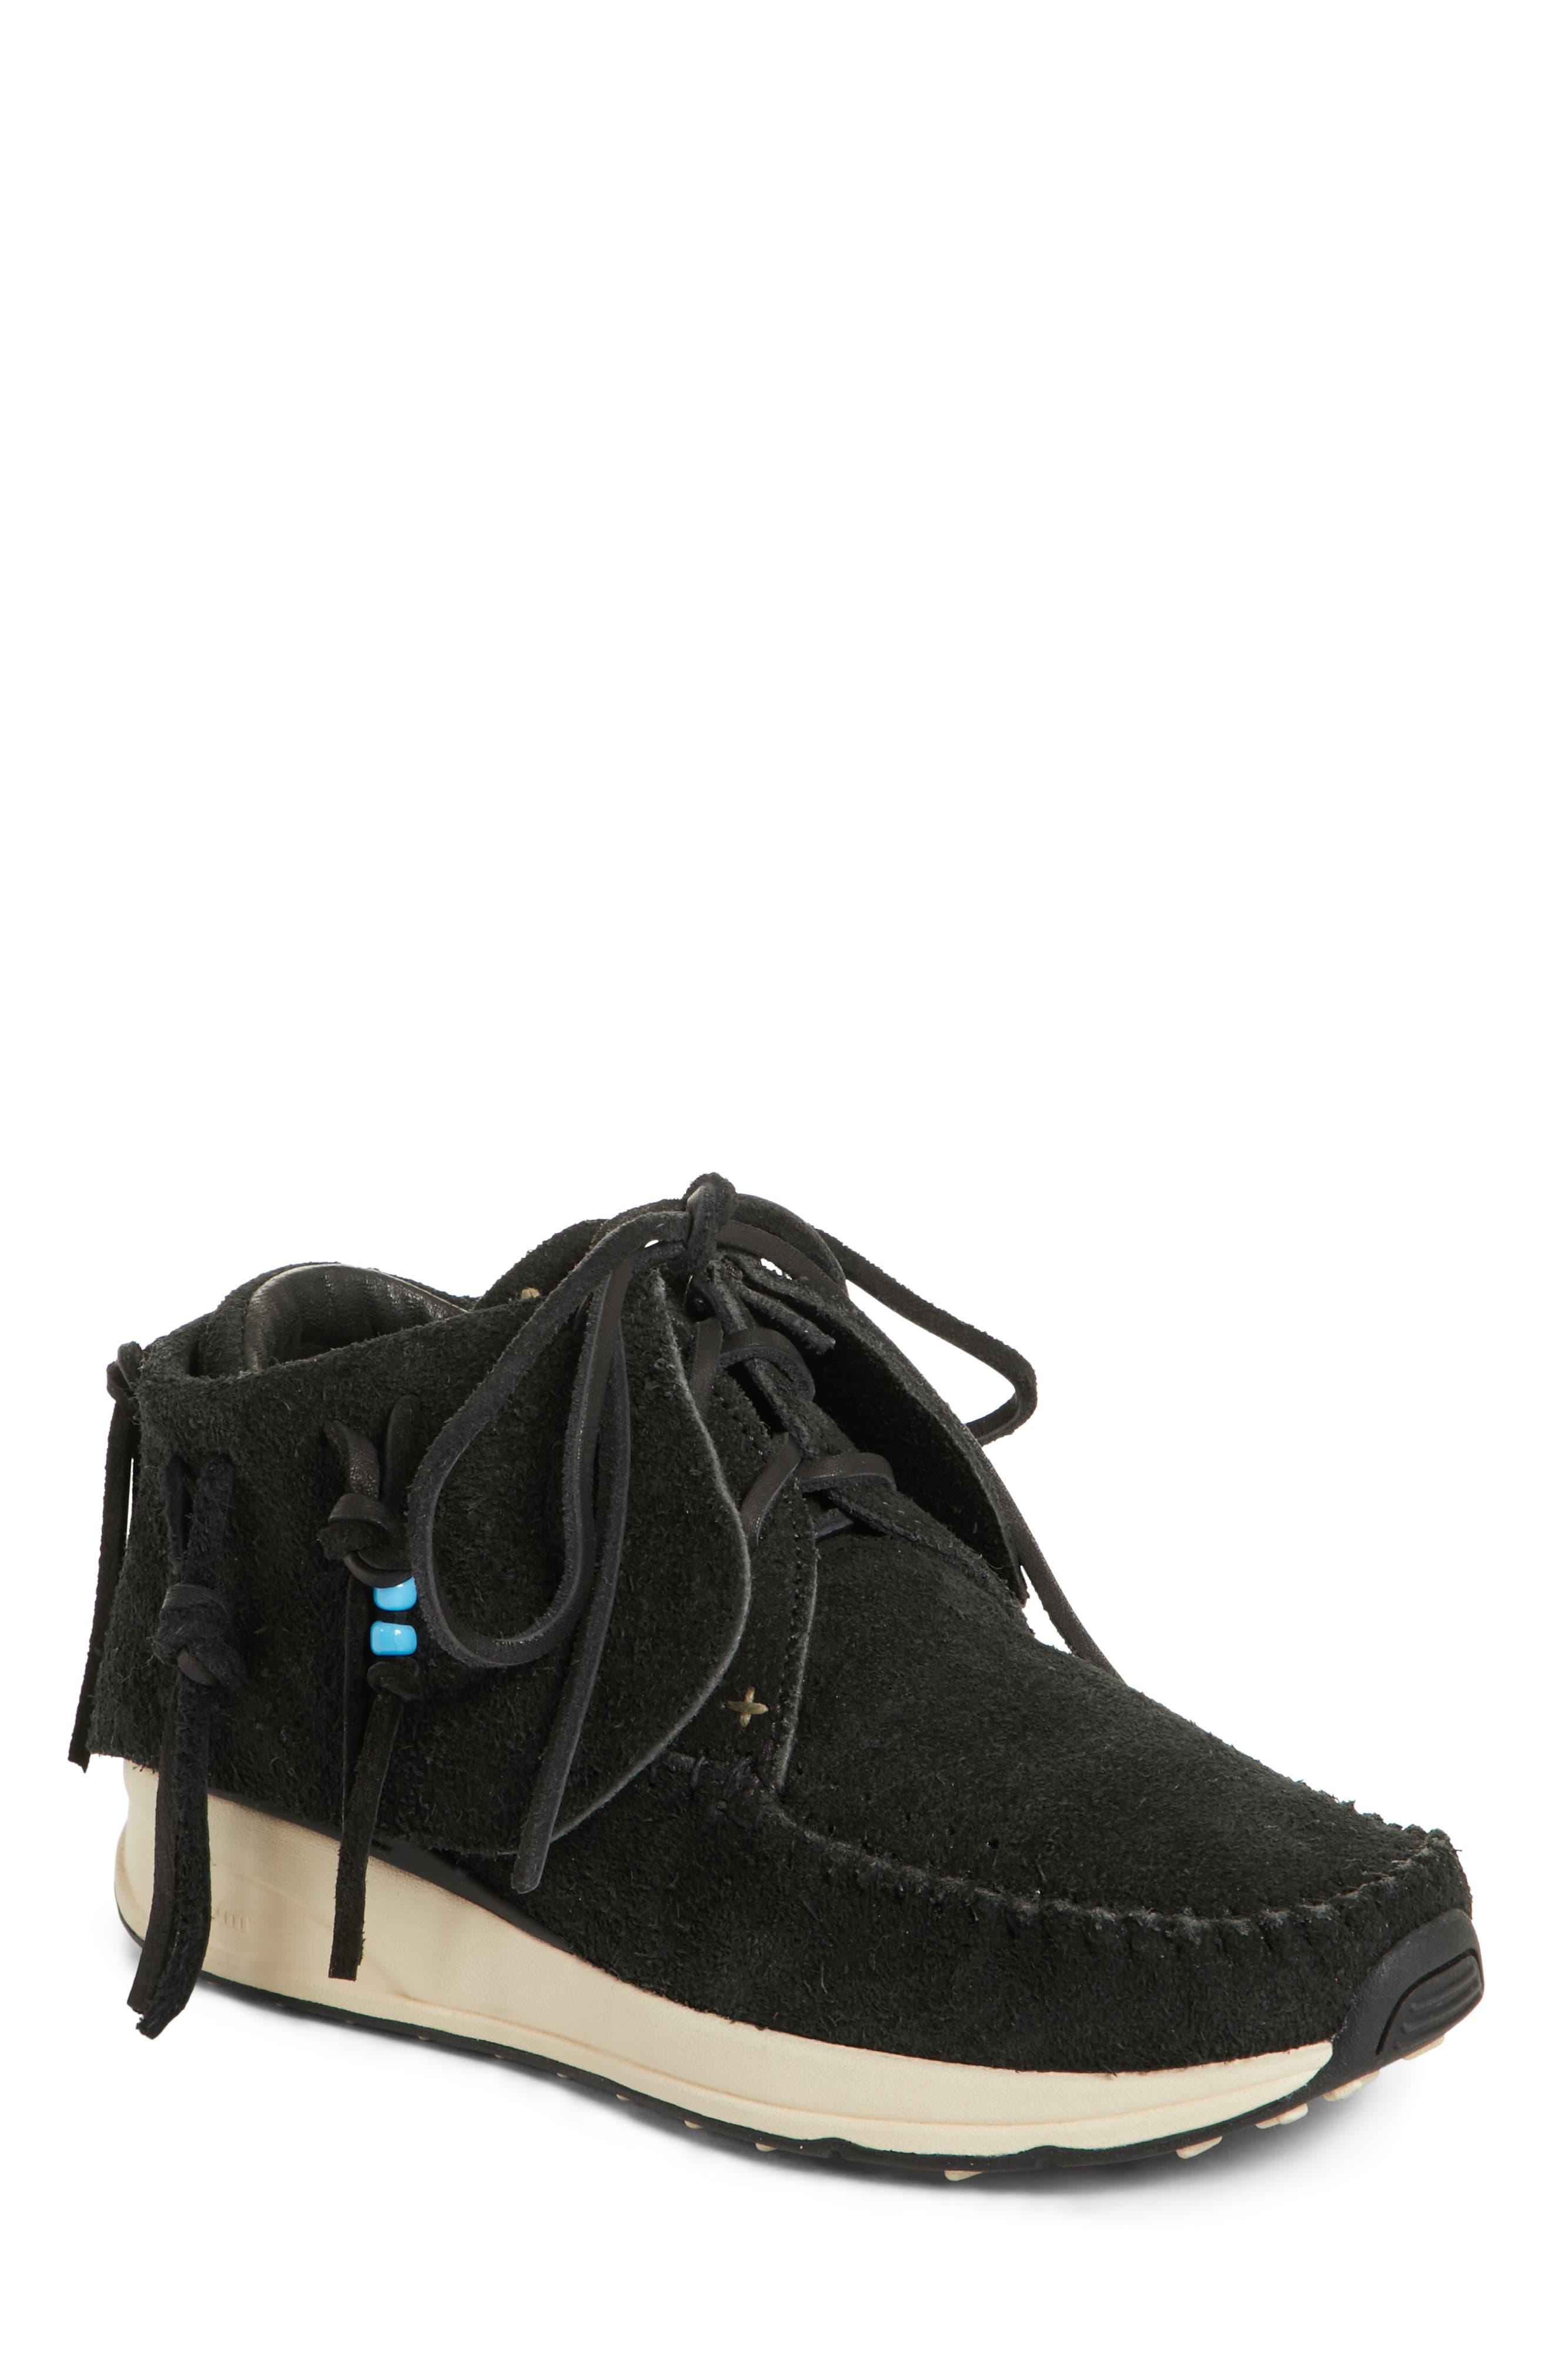 FBT Suede Moccasin Sneaker,                             Main thumbnail 1, color,                             003